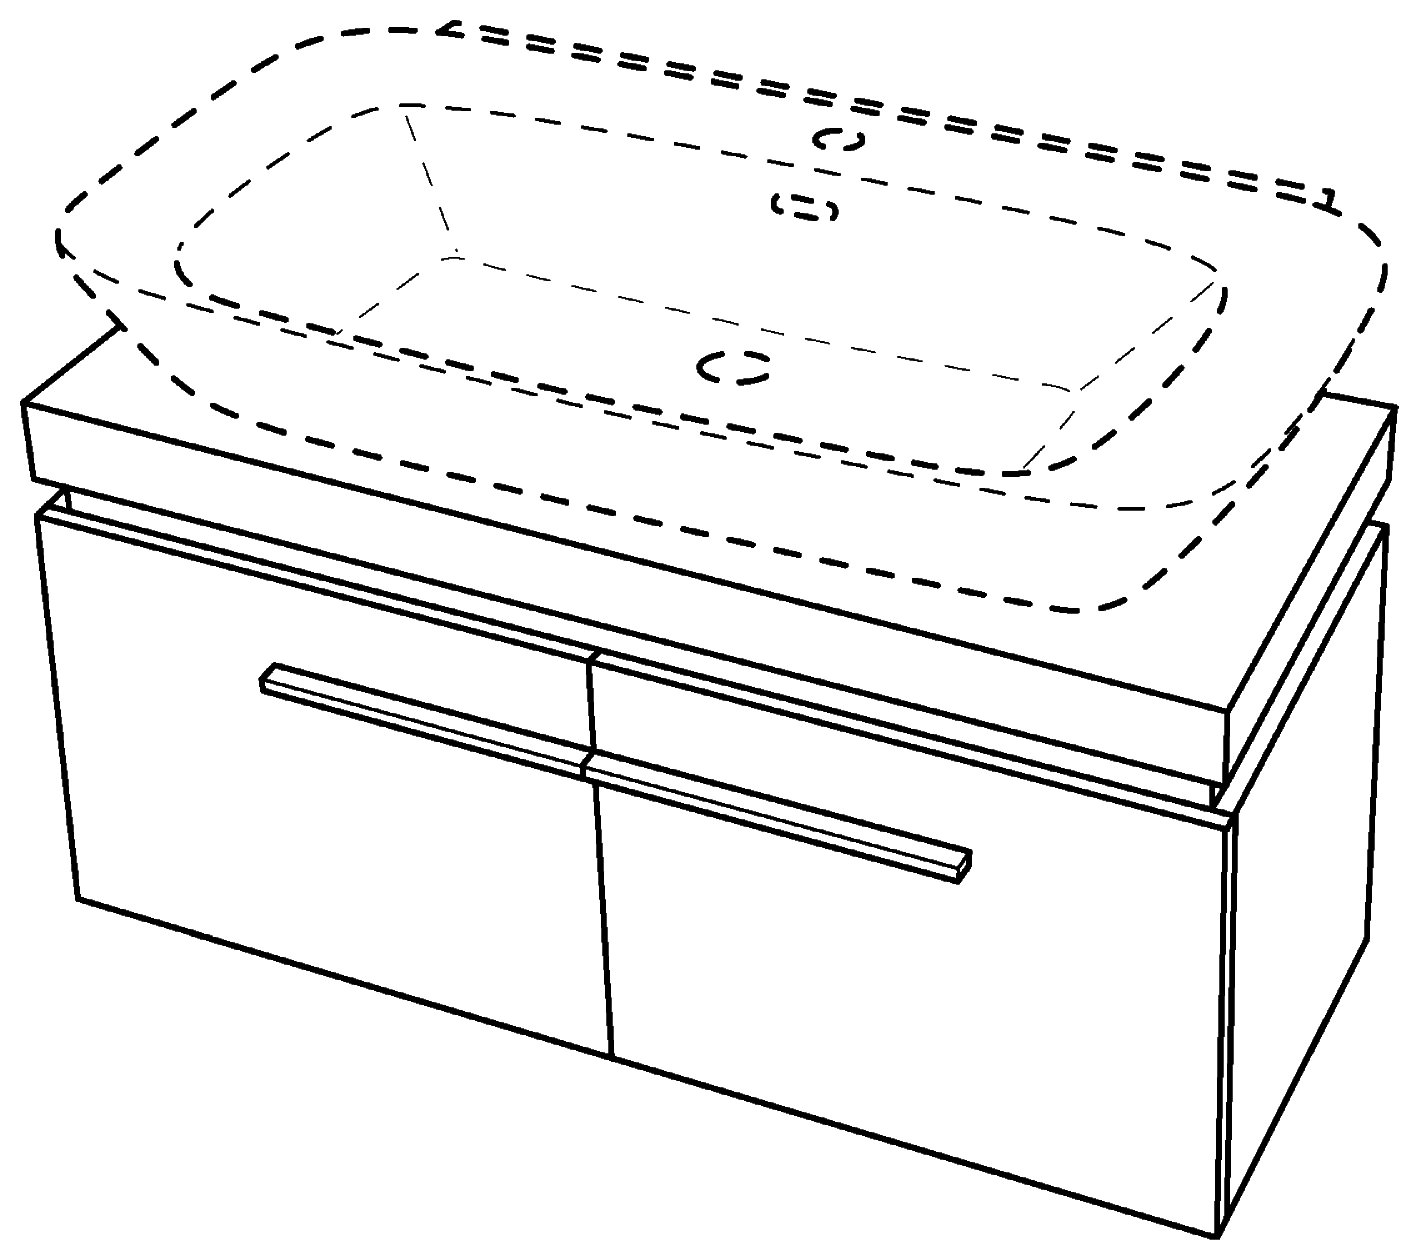 keramag silk waschtischunterschrank 816022 1200x400x470mm wei hochglanz 816022000. Black Bedroom Furniture Sets. Home Design Ideas